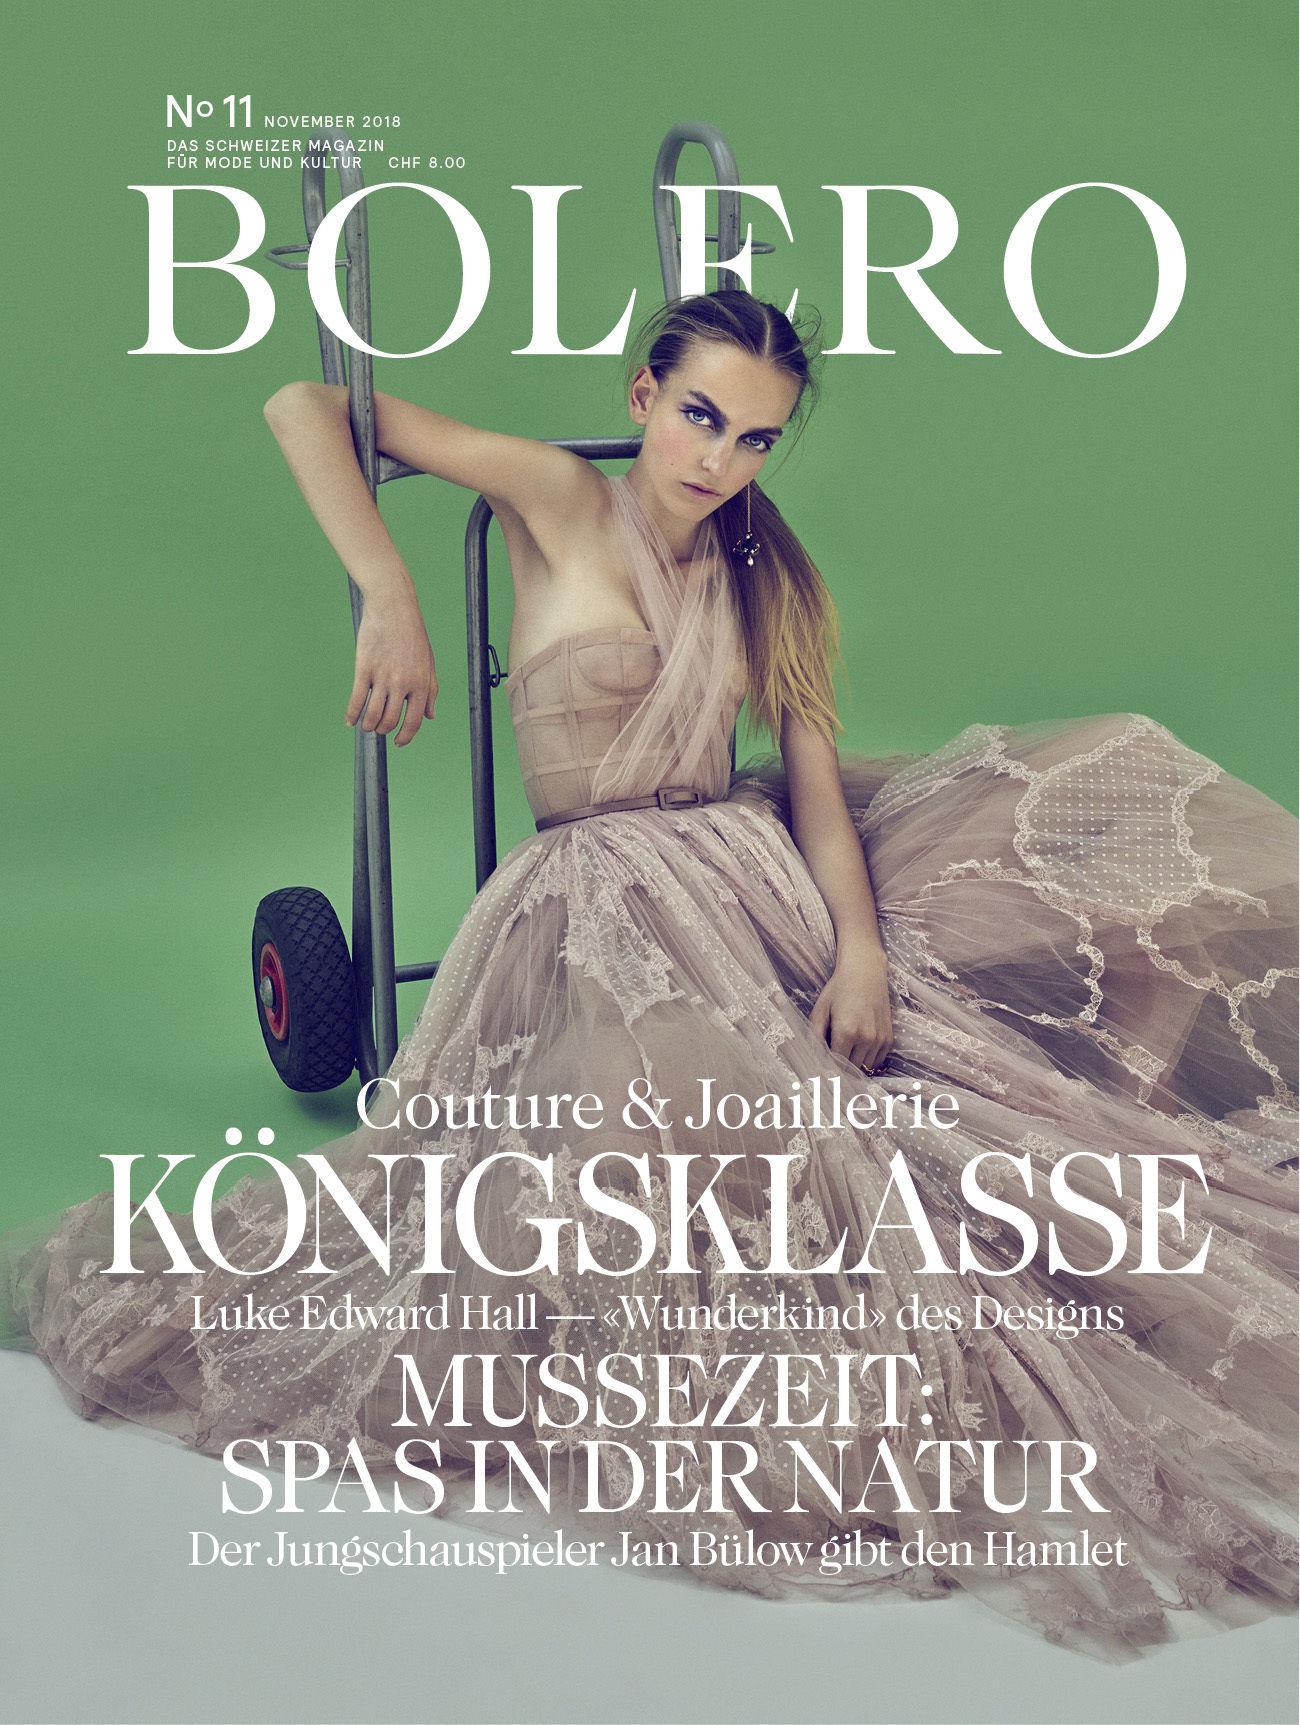 JPPS PRODUCTION SERVICES : Markus JANS for BOLERO Mag